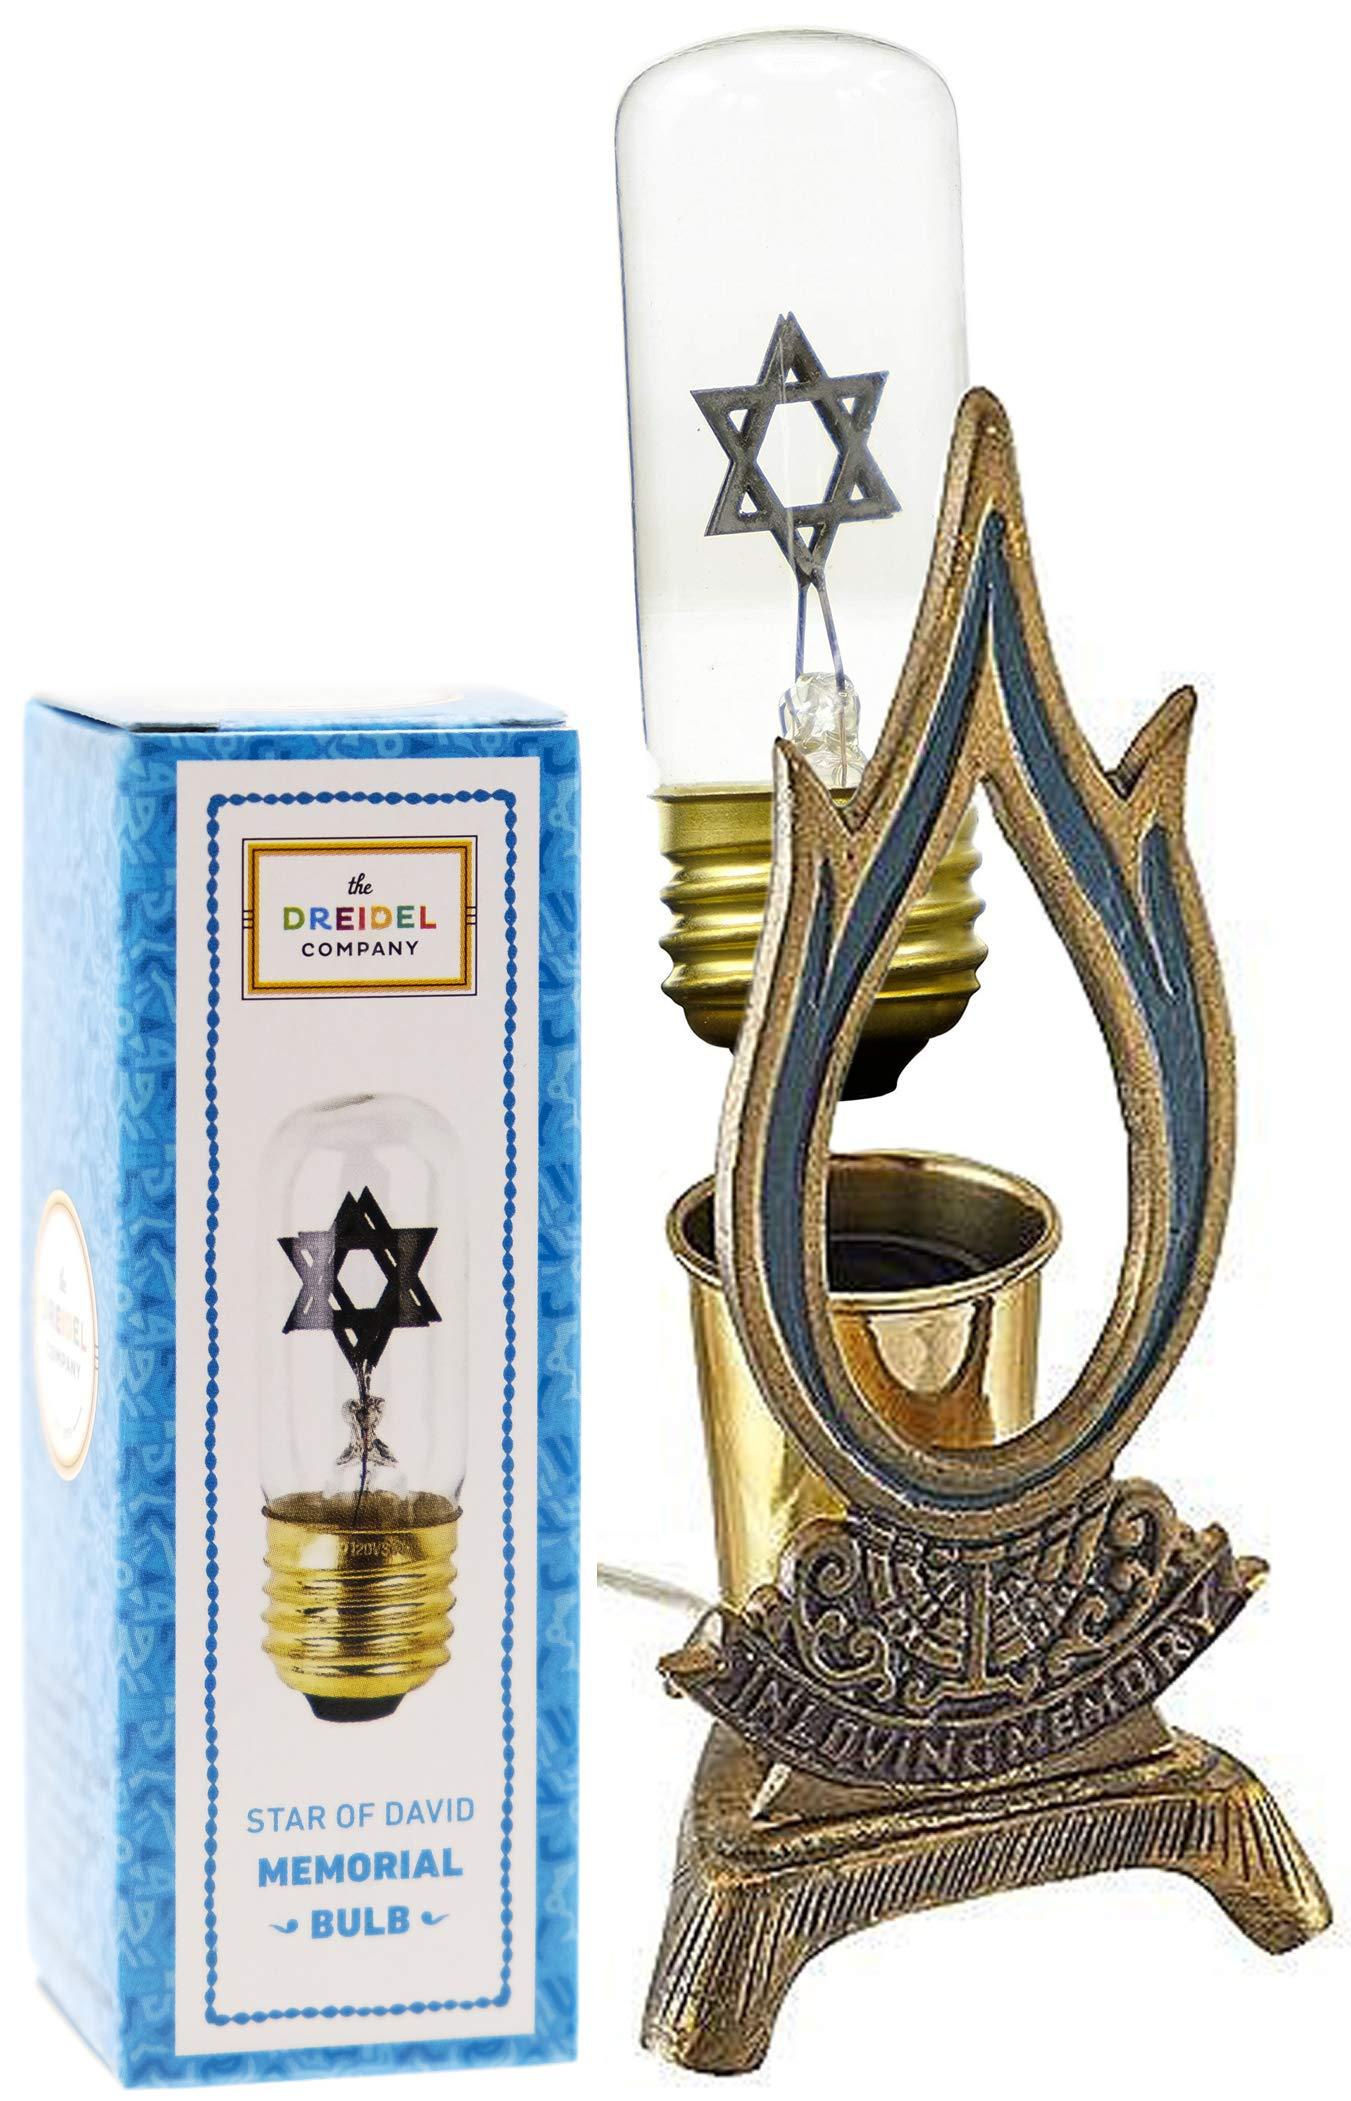 Flame Shaped Electric Memorial Lamp - Yahrzeit by The Dreidel Company